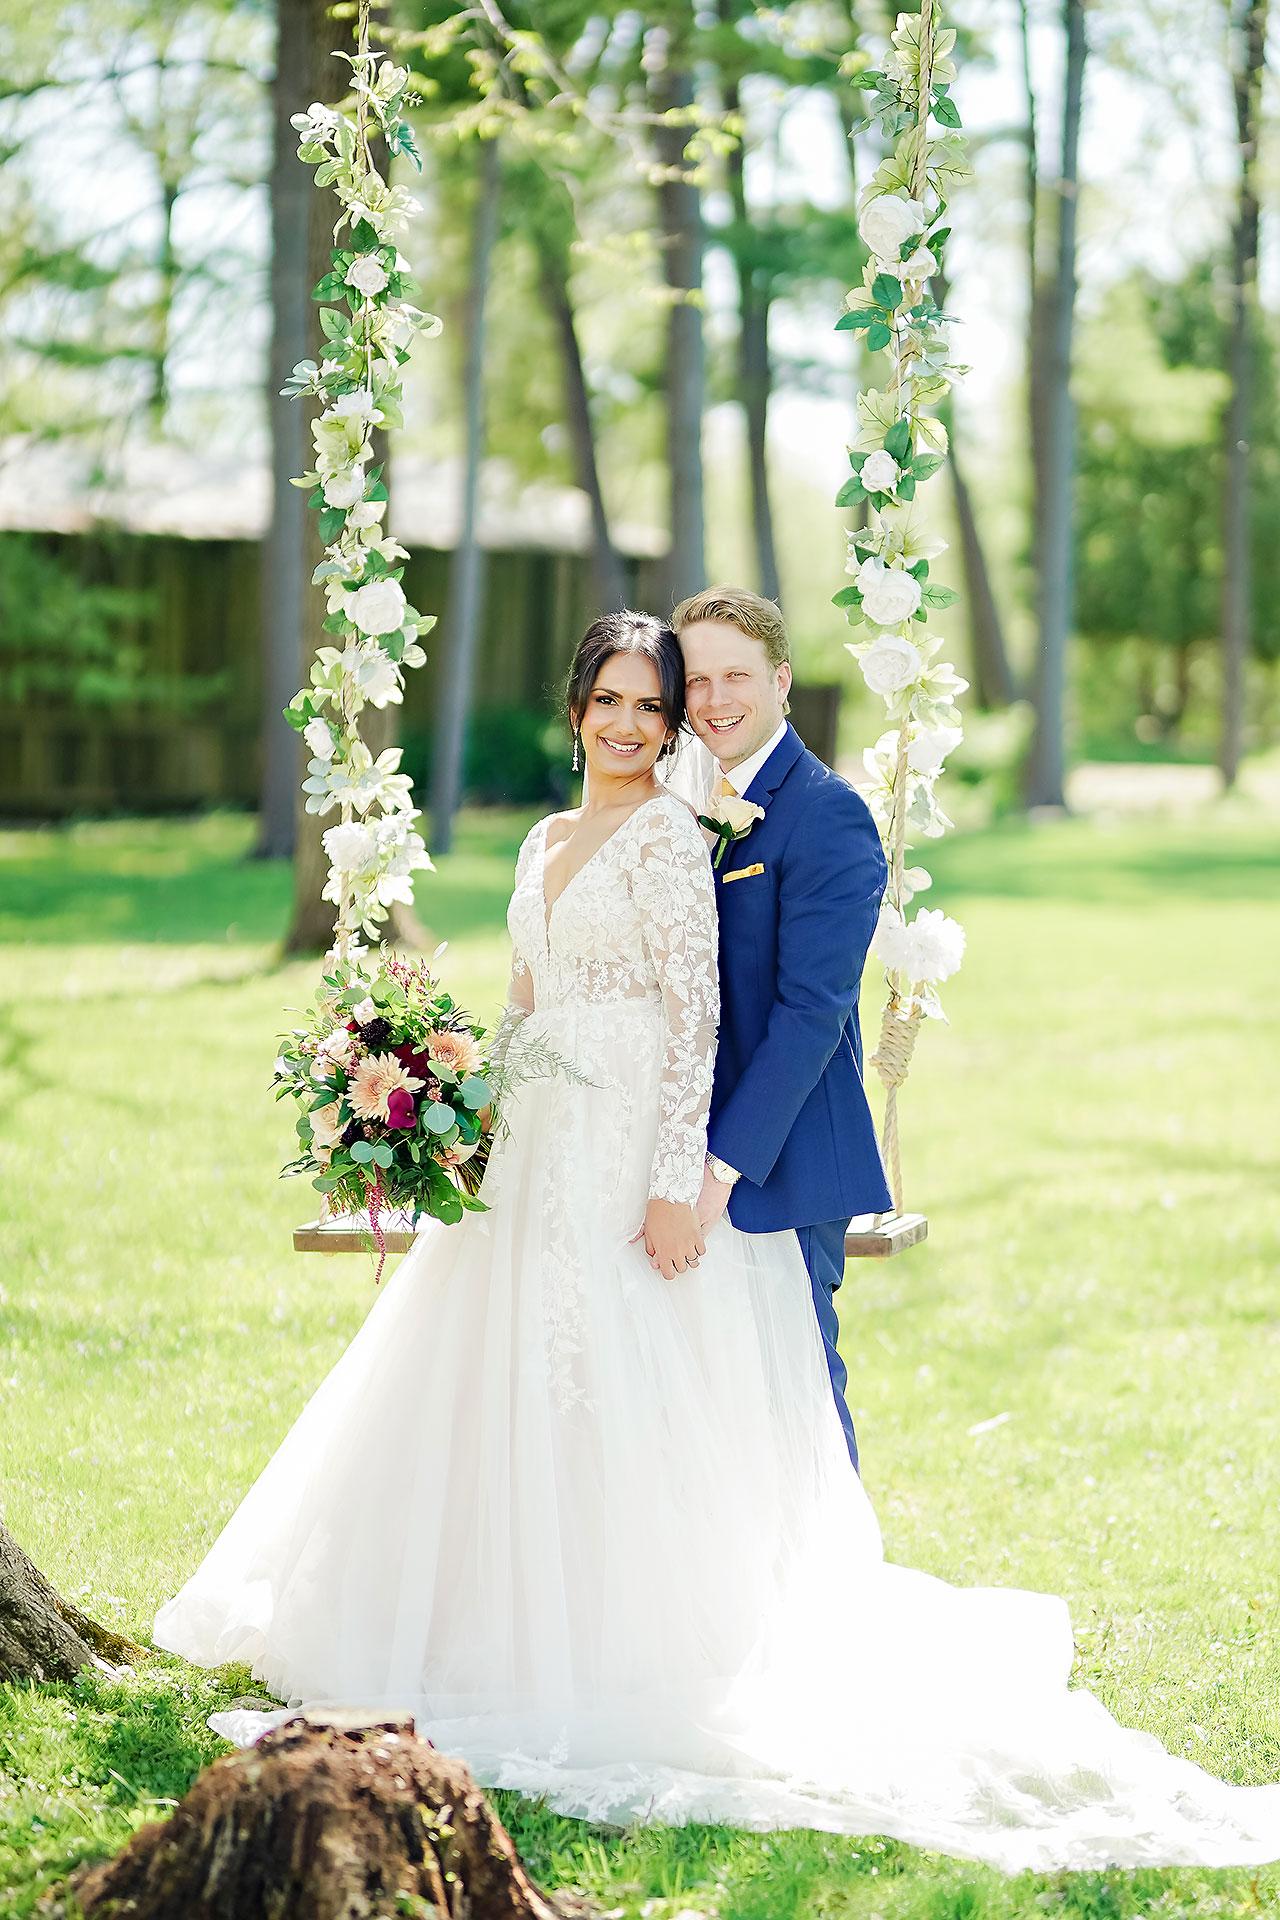 Nadia Parker Black Iris Estate Carmel Indiana Wedding May 2021 088